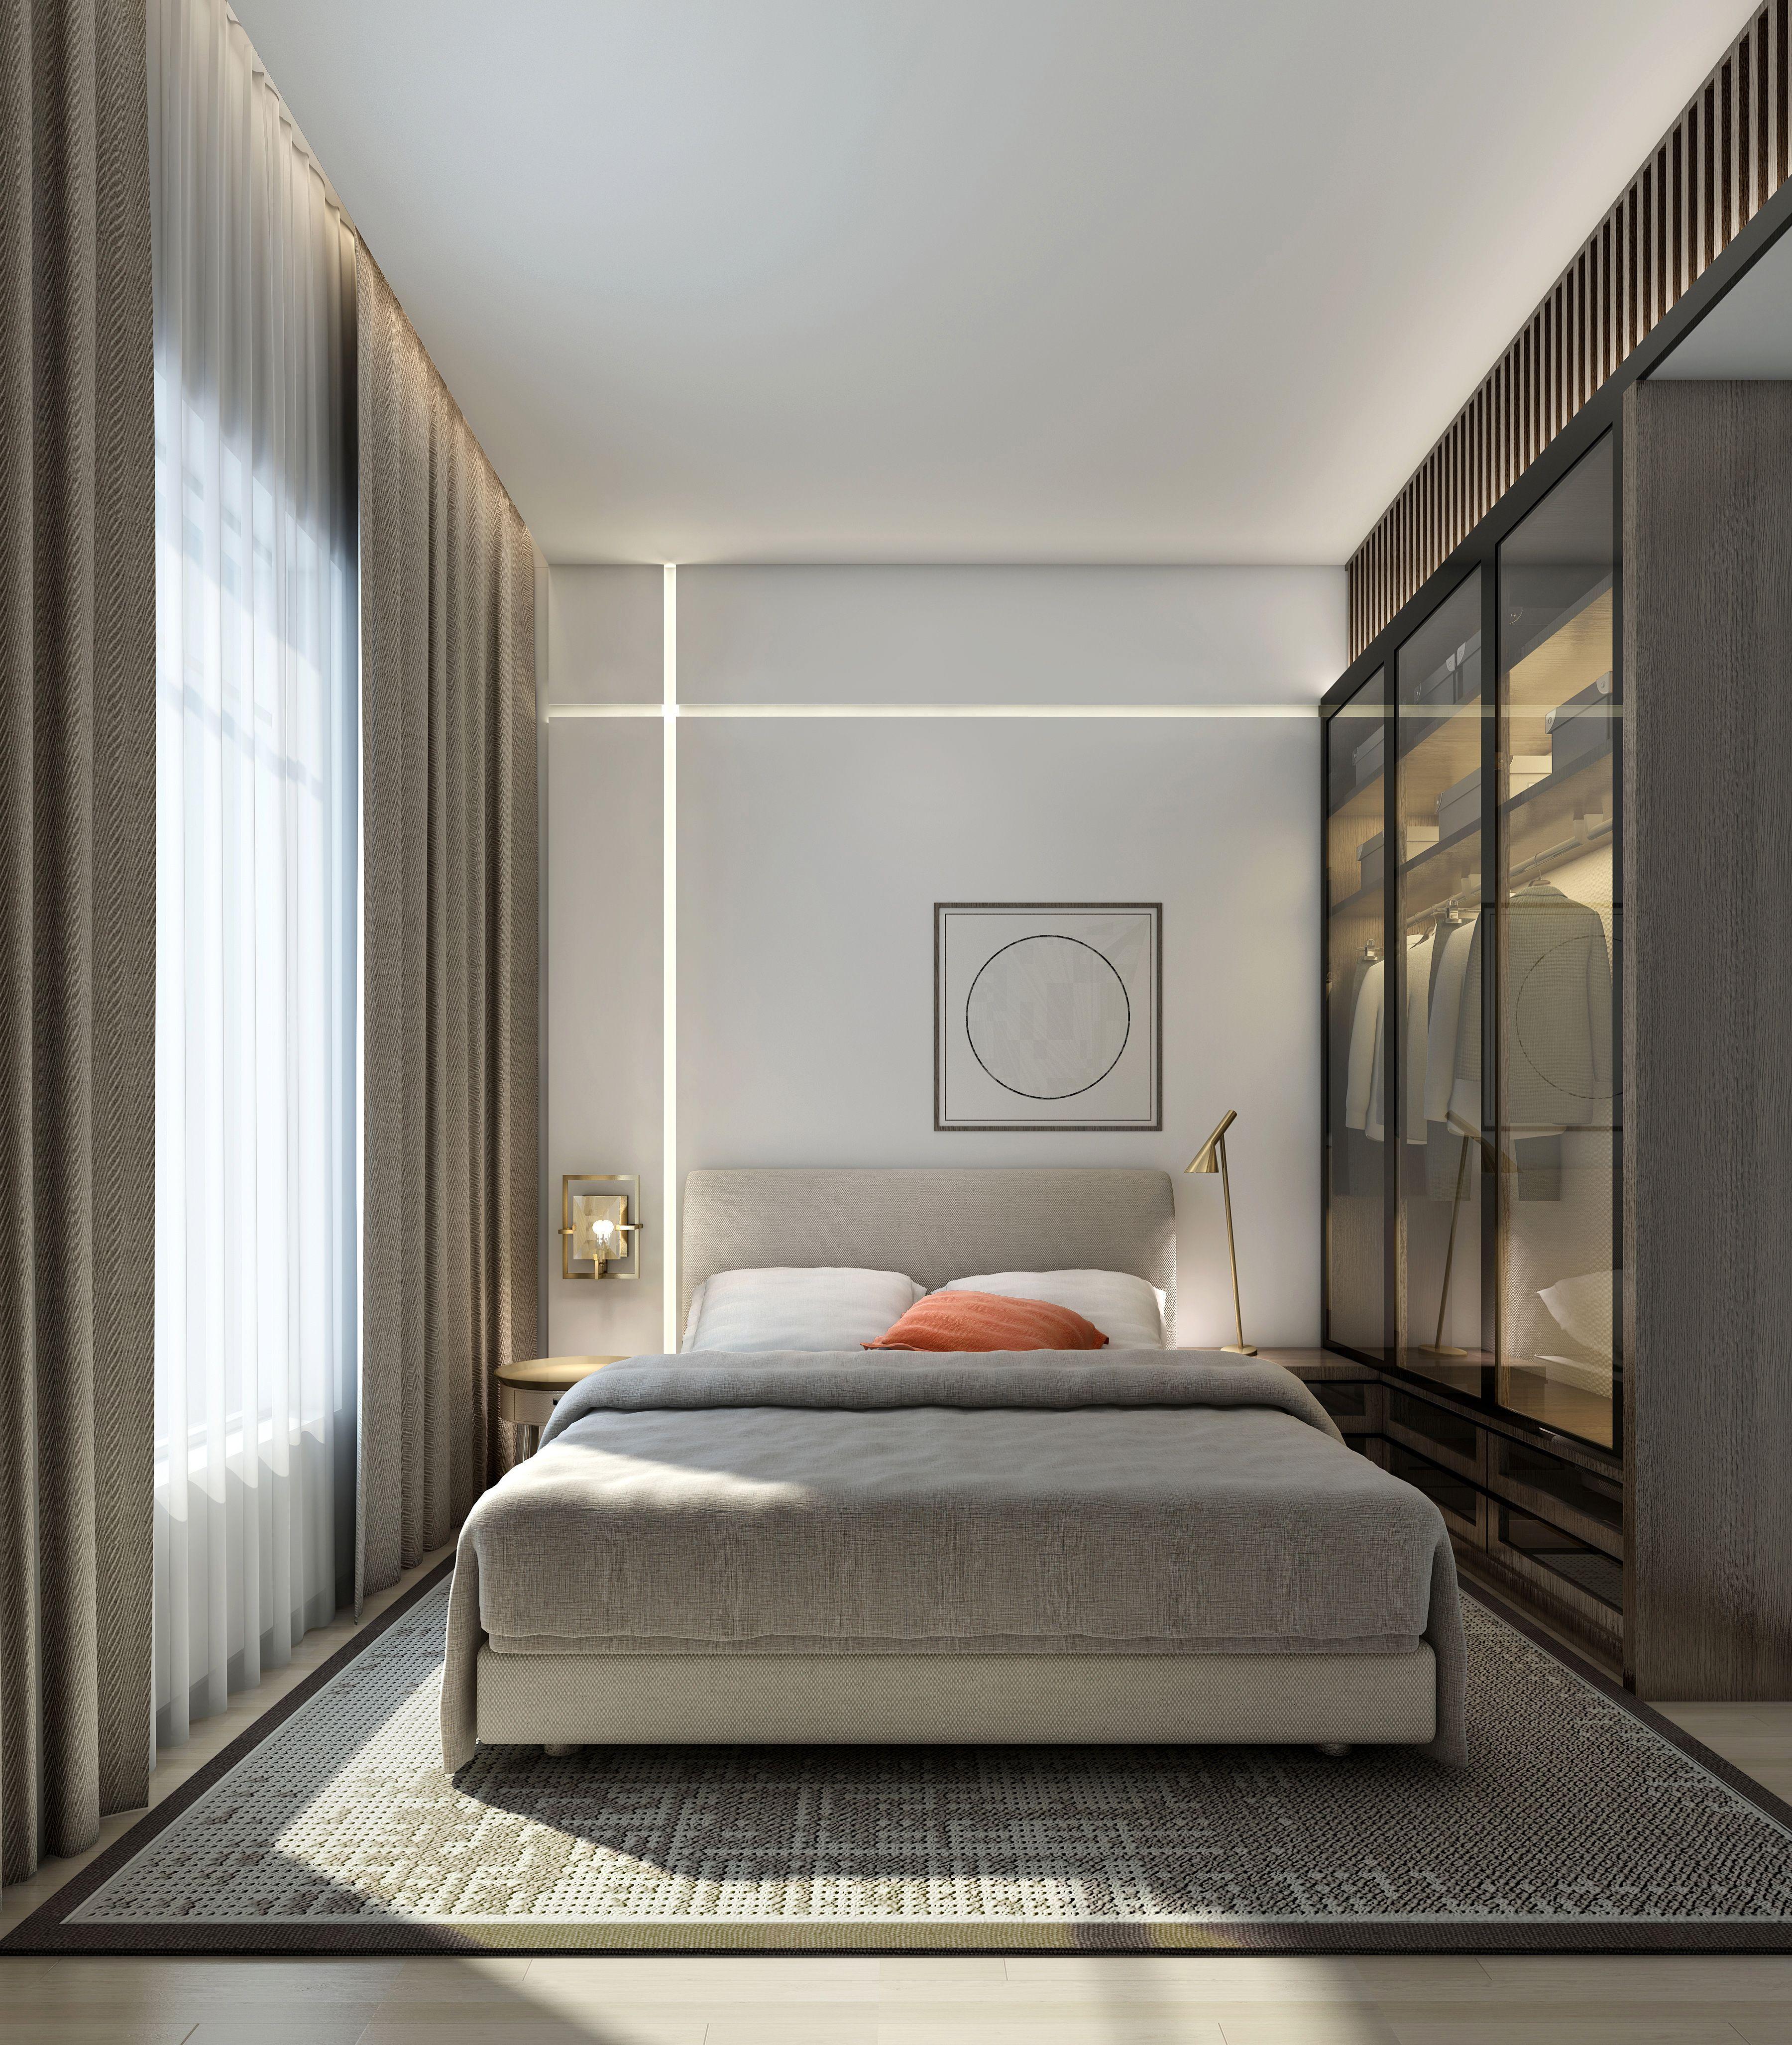 101 Best Small Apartment Bedroom Decor Ideas Decoratoo Apartment Bedroom Decor Modern Bedroom Design Small Master Bedroom Bedroom design modern contemporary